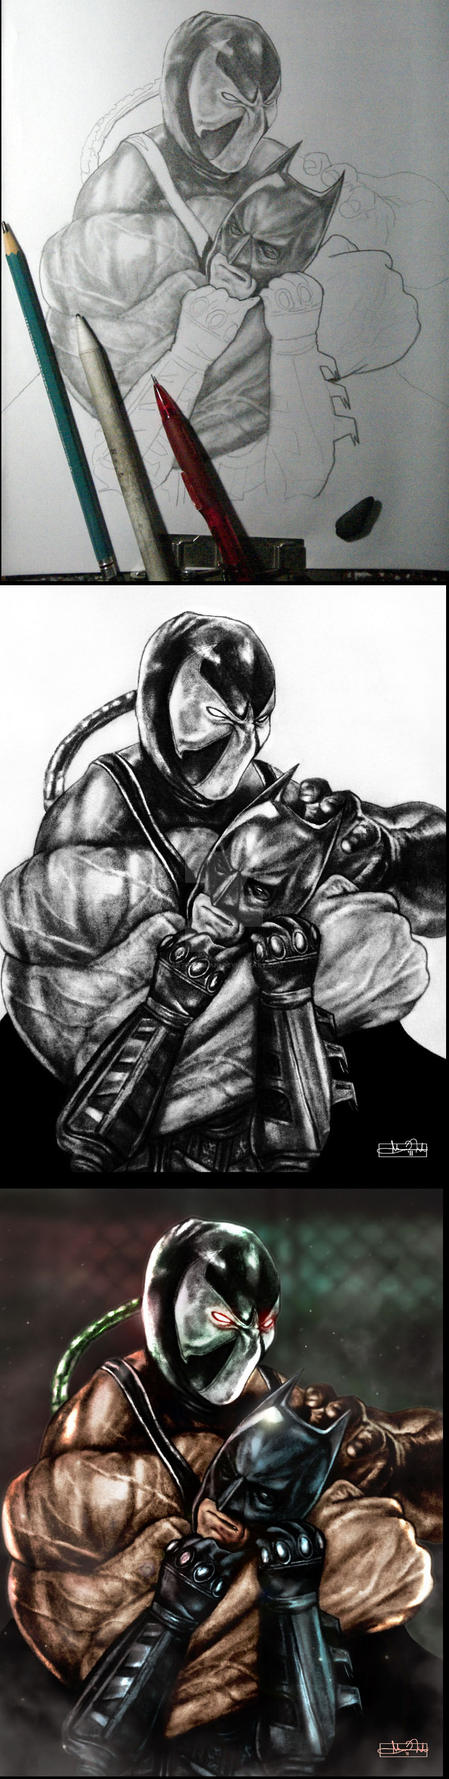 The Dark Knight Falls process by Art-by-Jilani